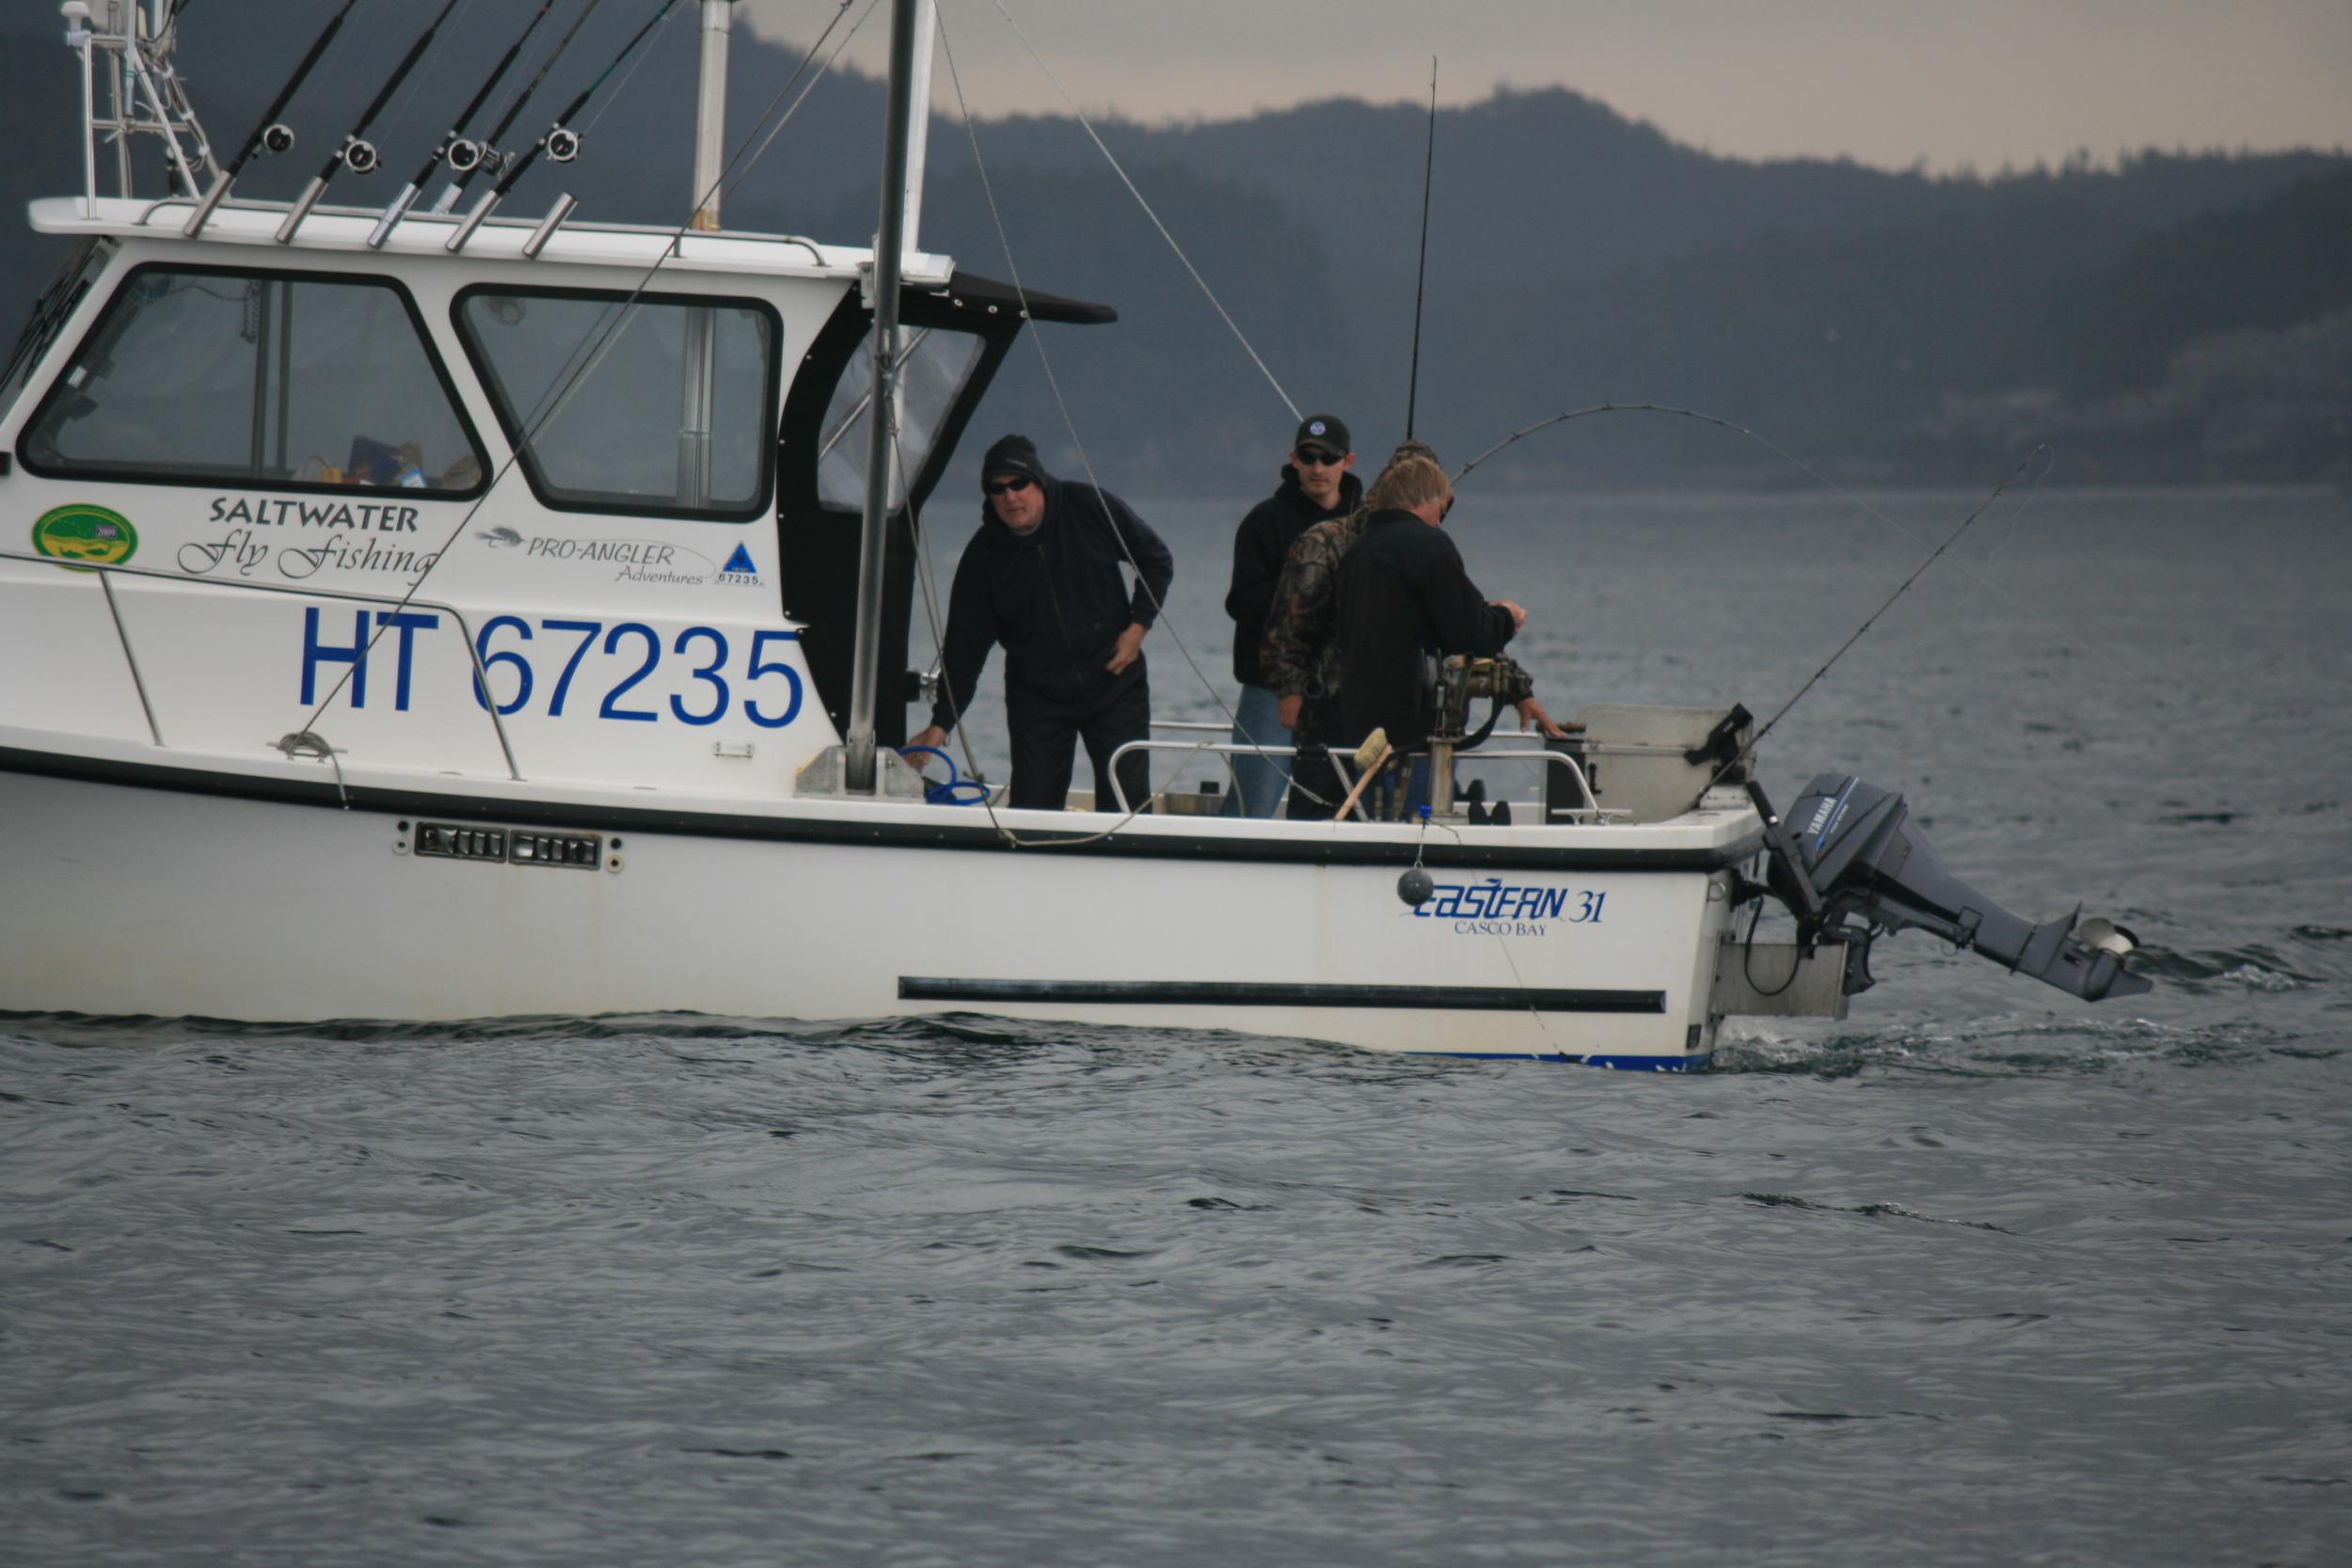 Southeast Alaska Charter Fishing Vessel